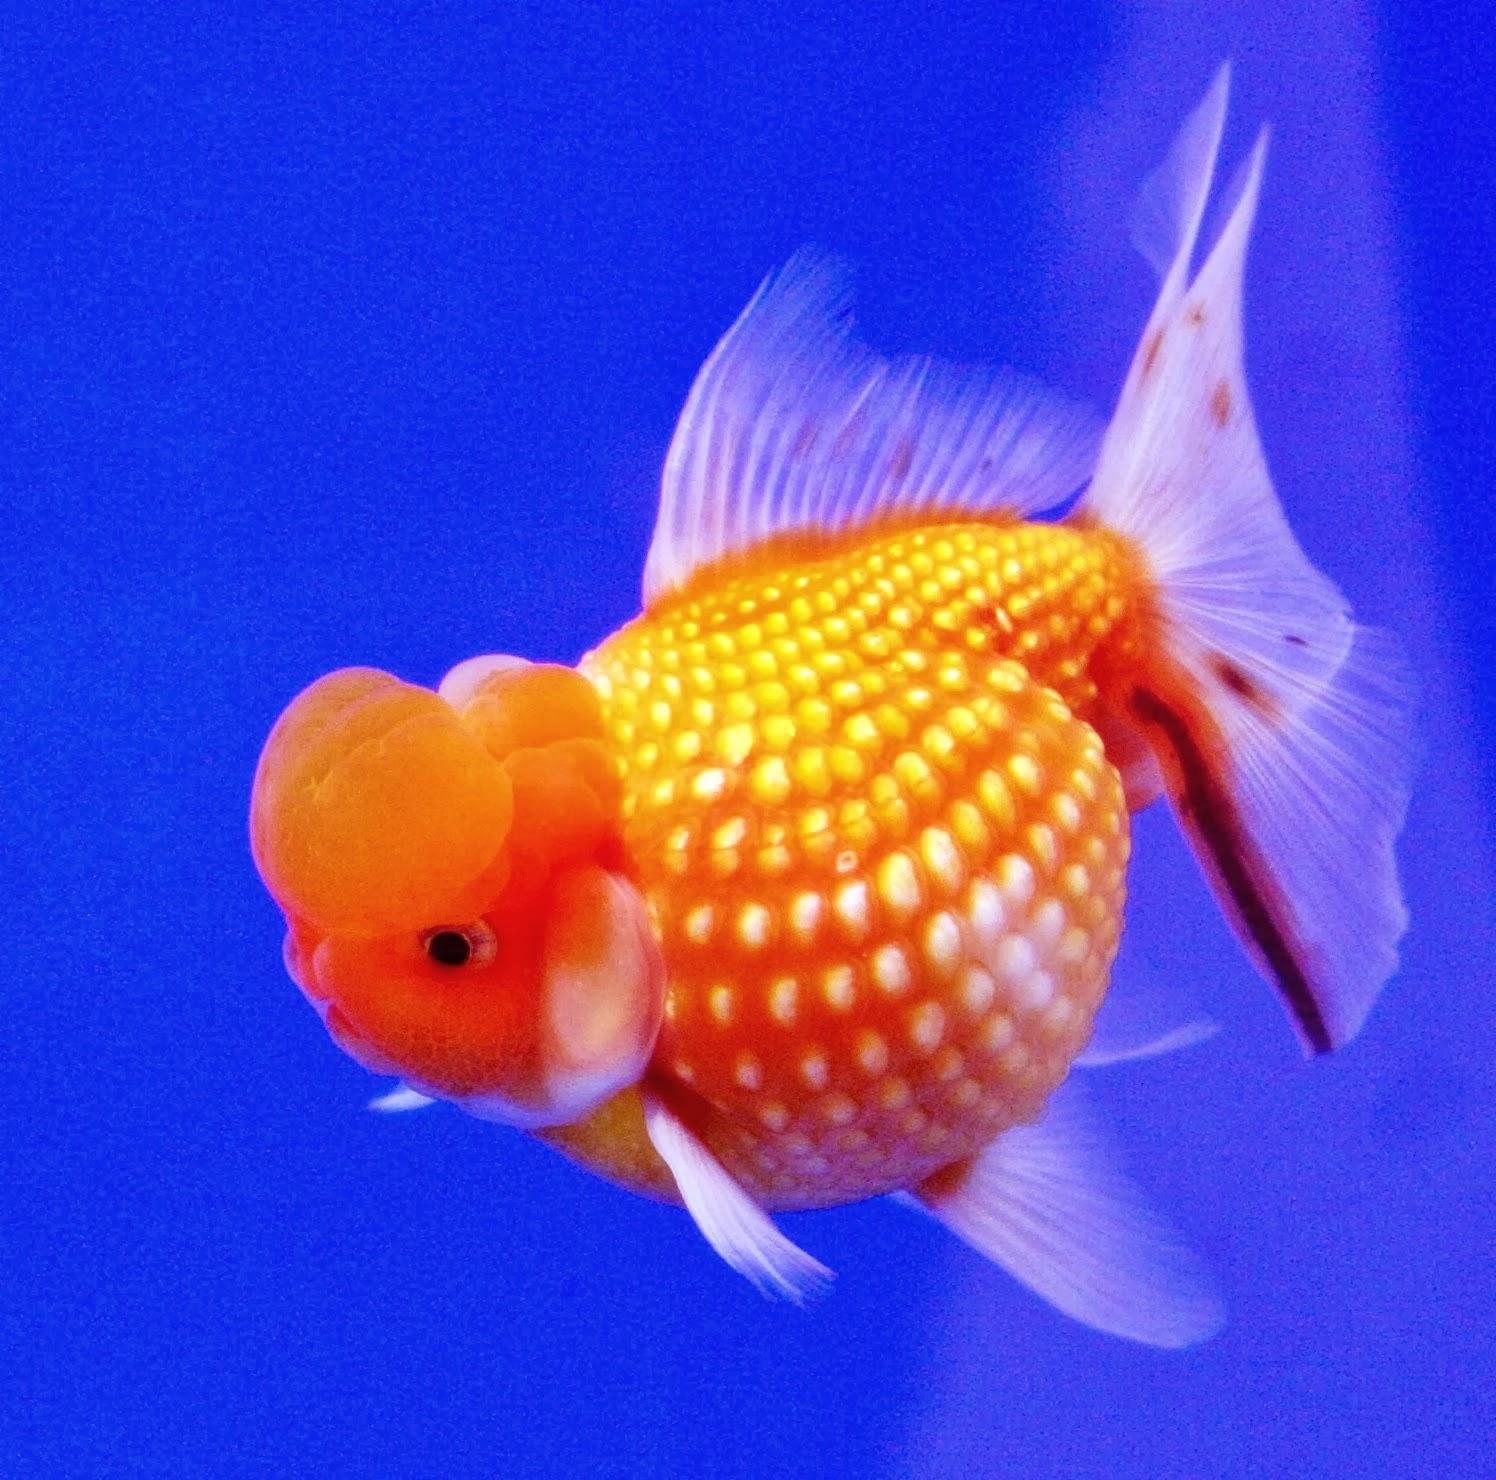 fish share GAMBAR IKAN HIAS KOI PILIHAN 2